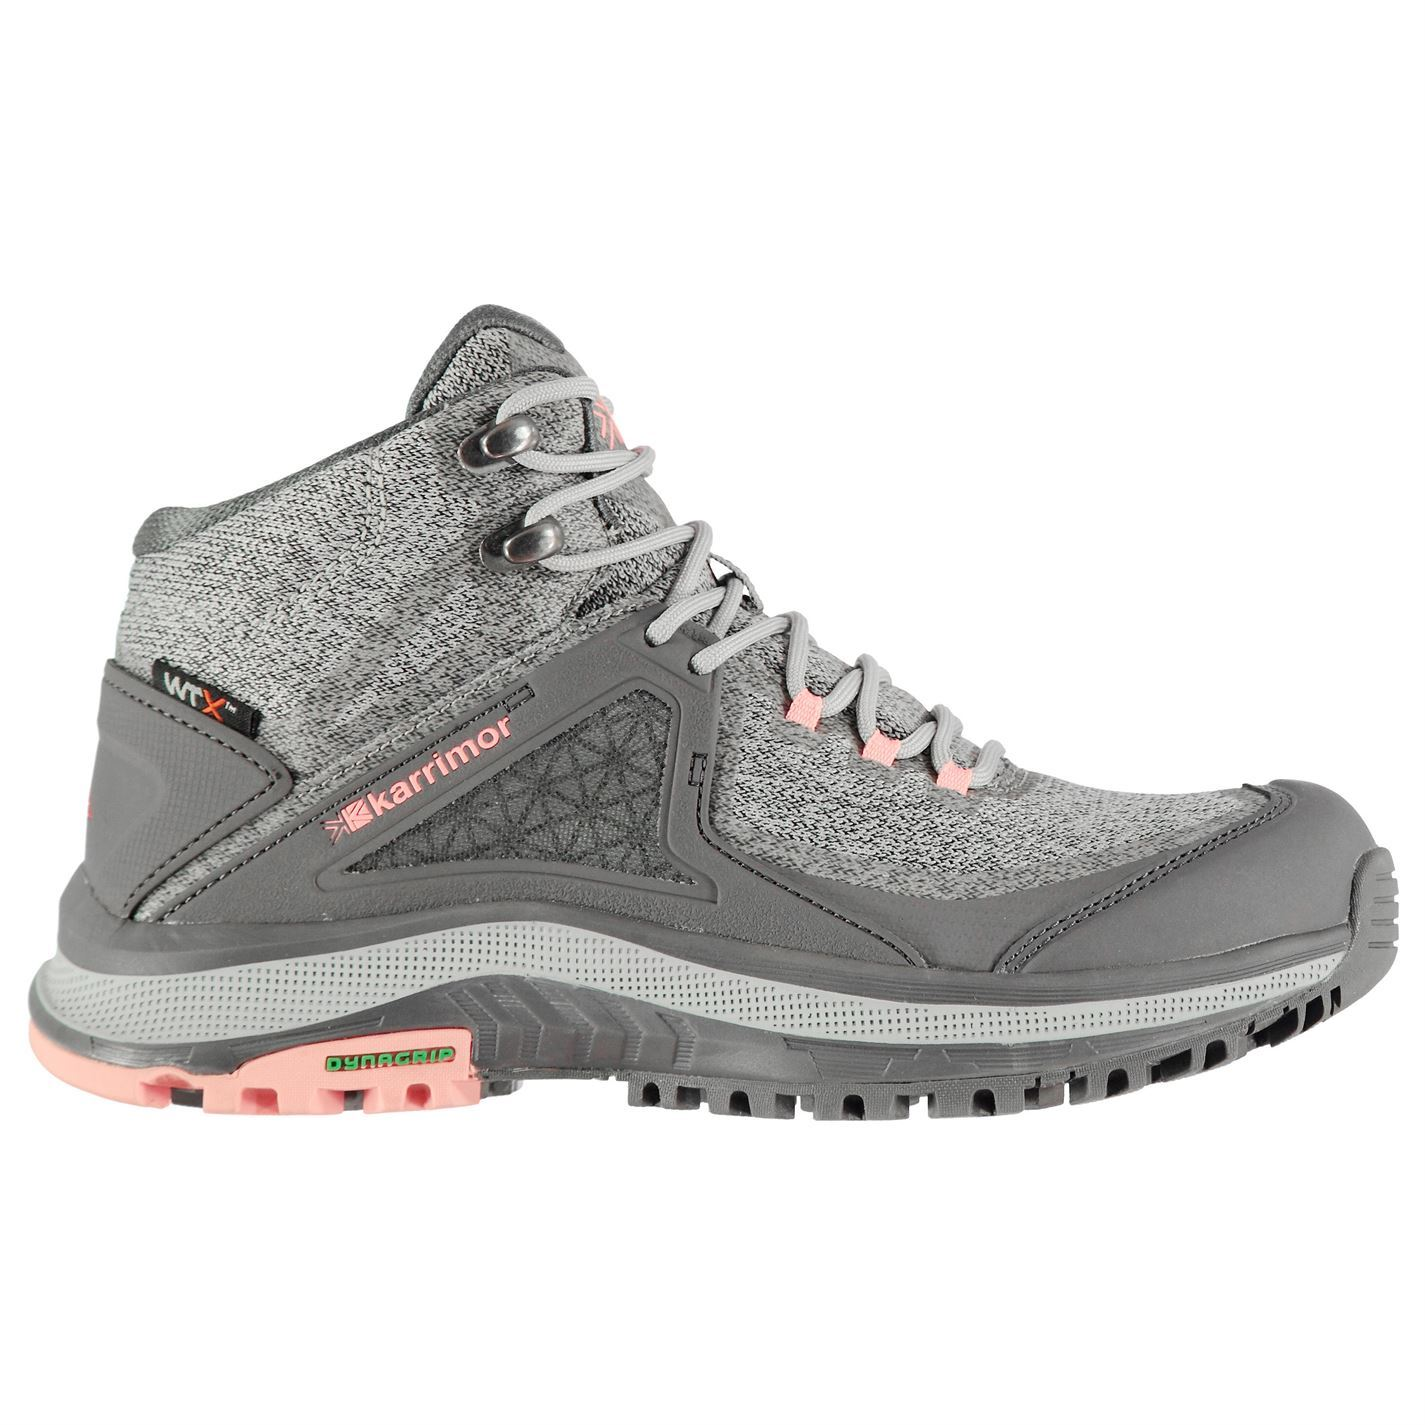 Details about Karrimor Stanedge WTX Walking Boots Womens Hiking Trekking Shoes Footwear